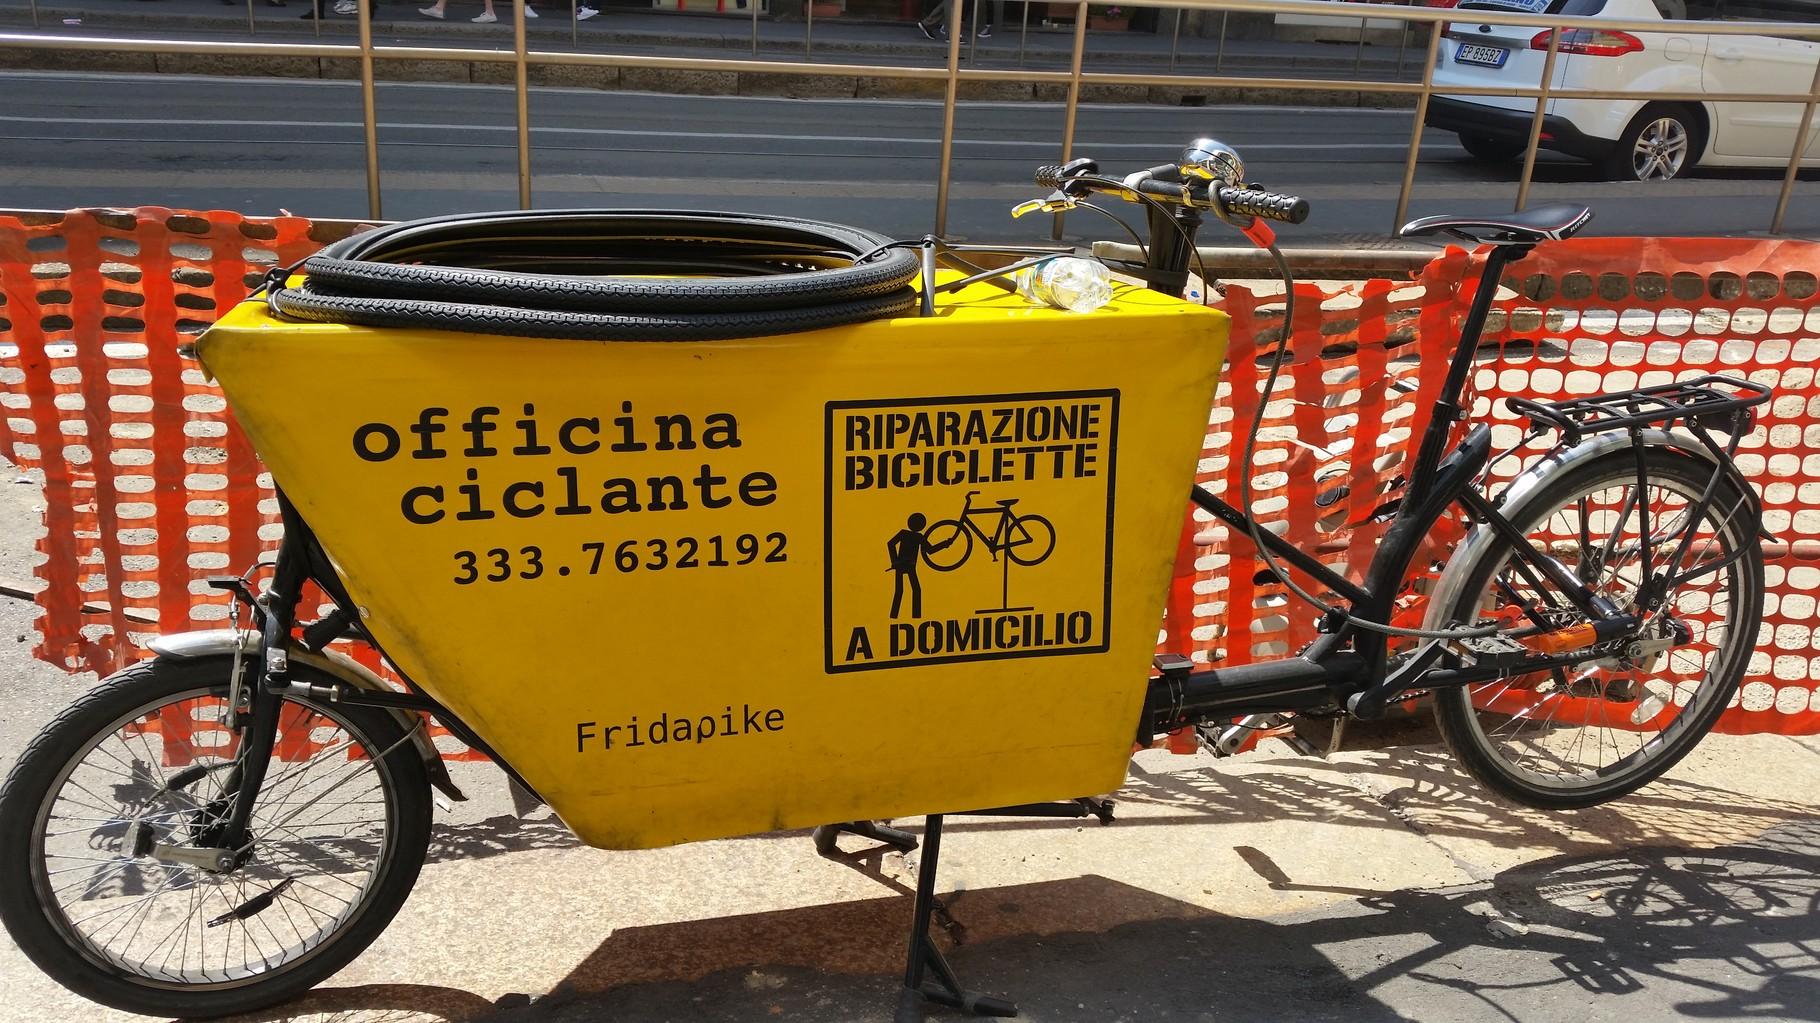 Bici officina mobile 2015